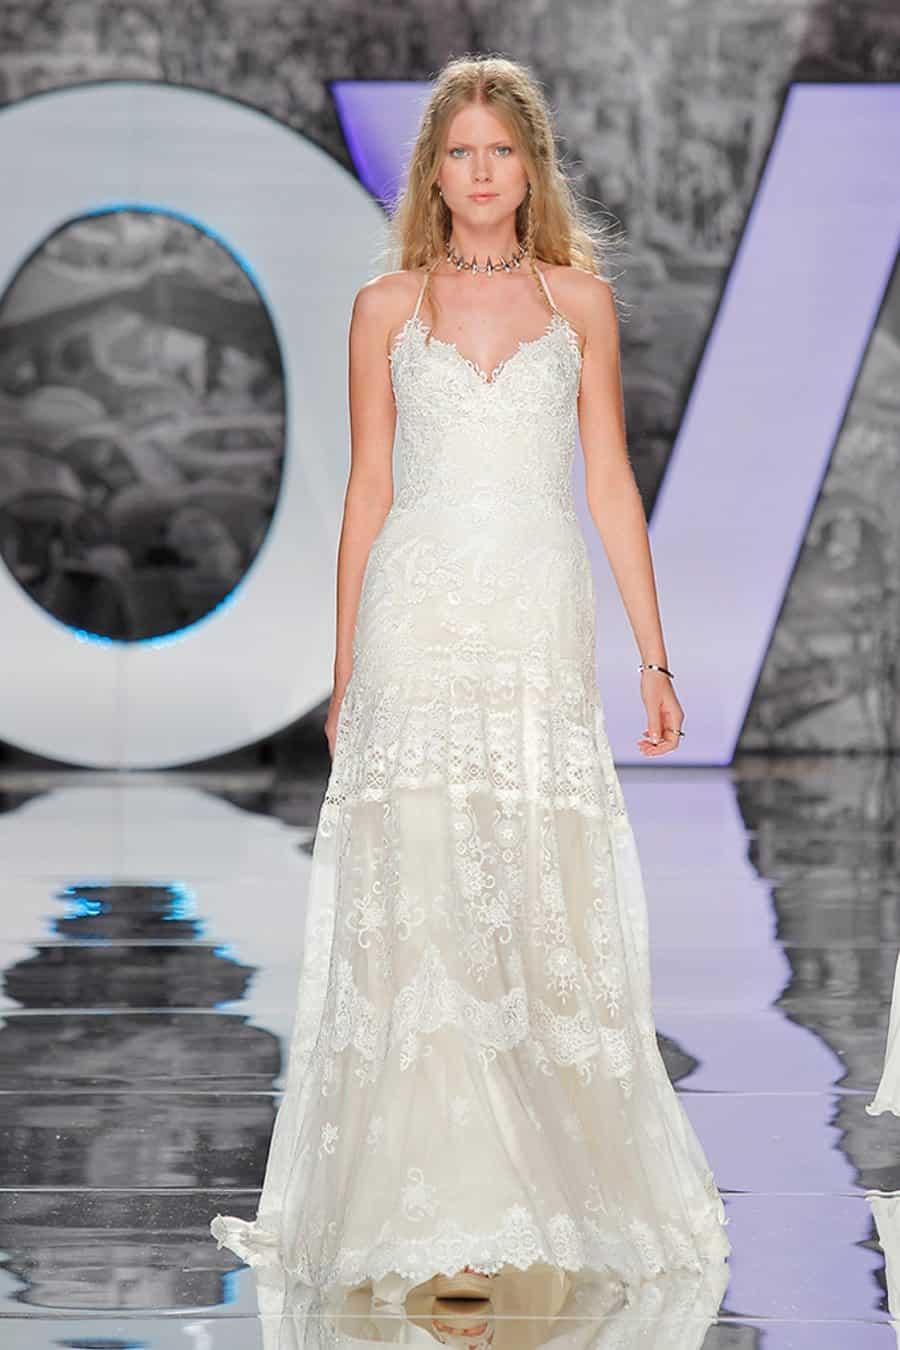 yolancris-weddingdress-bride-boho-chic-folk-wedding-dress-couture-fashion-desing-bohodress-19